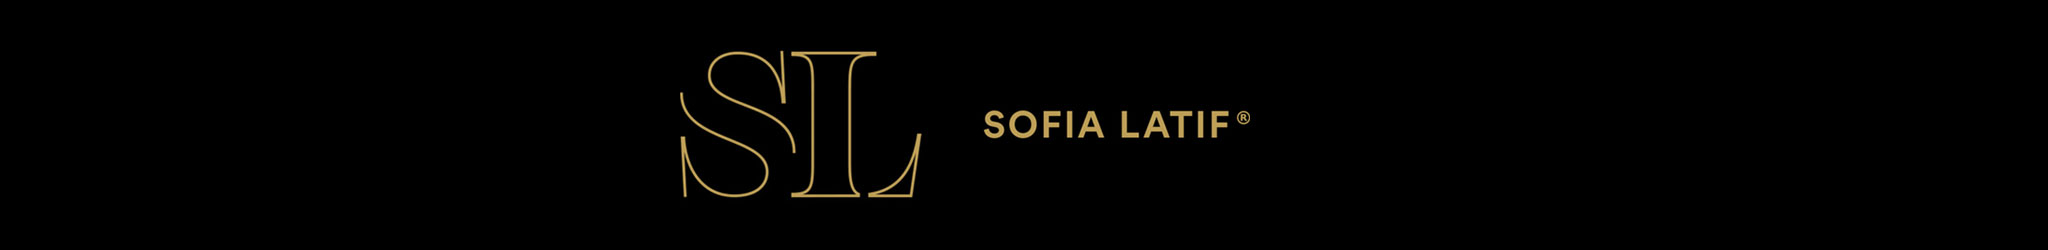 SOFIA LATIF™